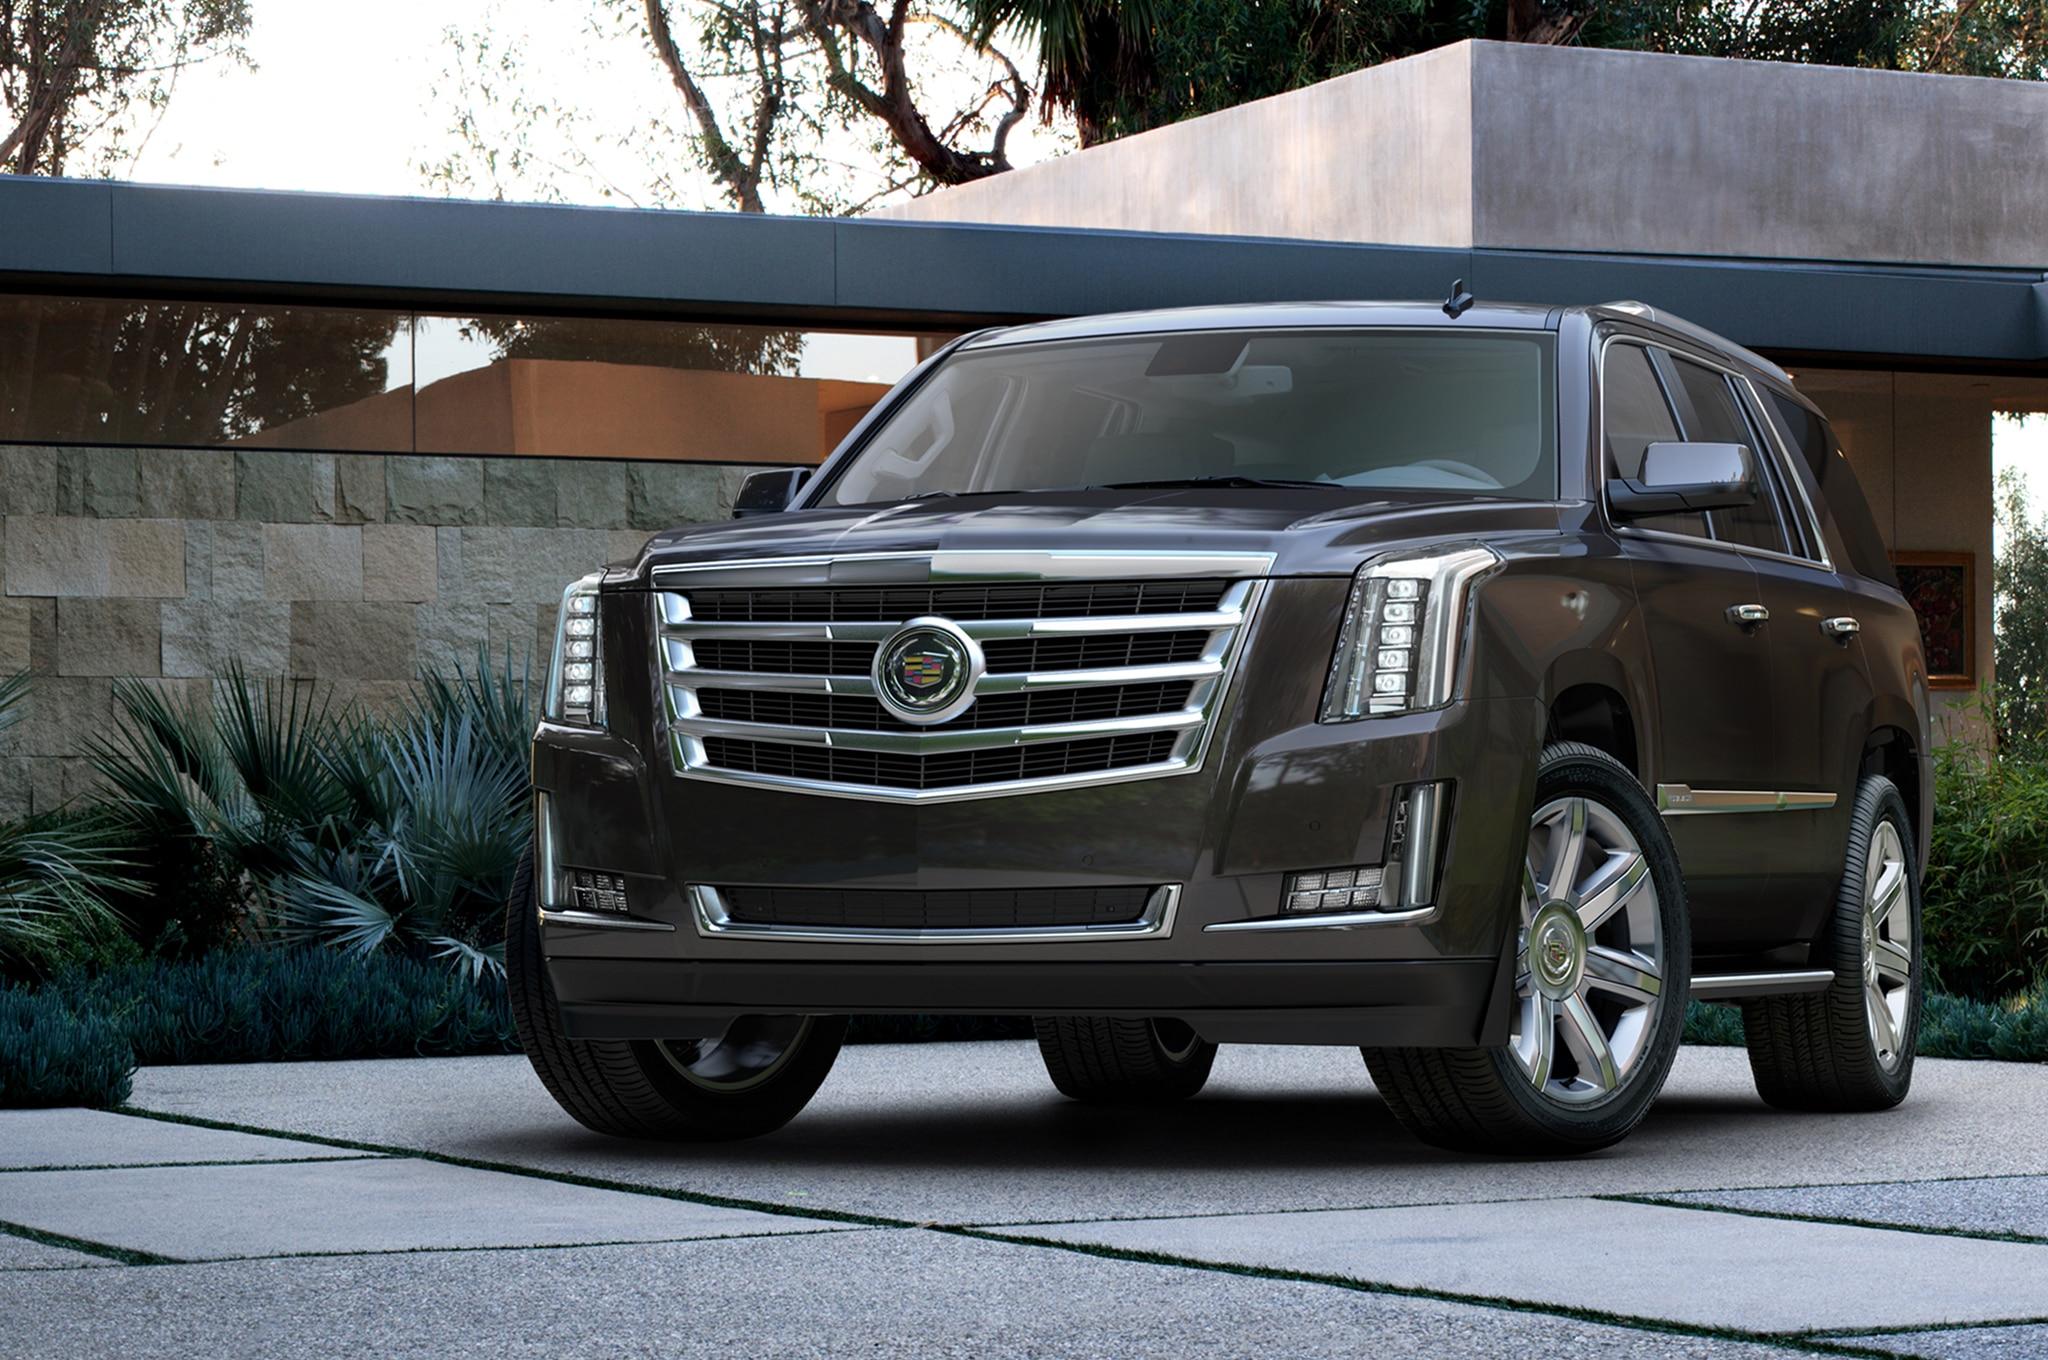 2015 Cadillac Escalade Front Three Quarters View 011